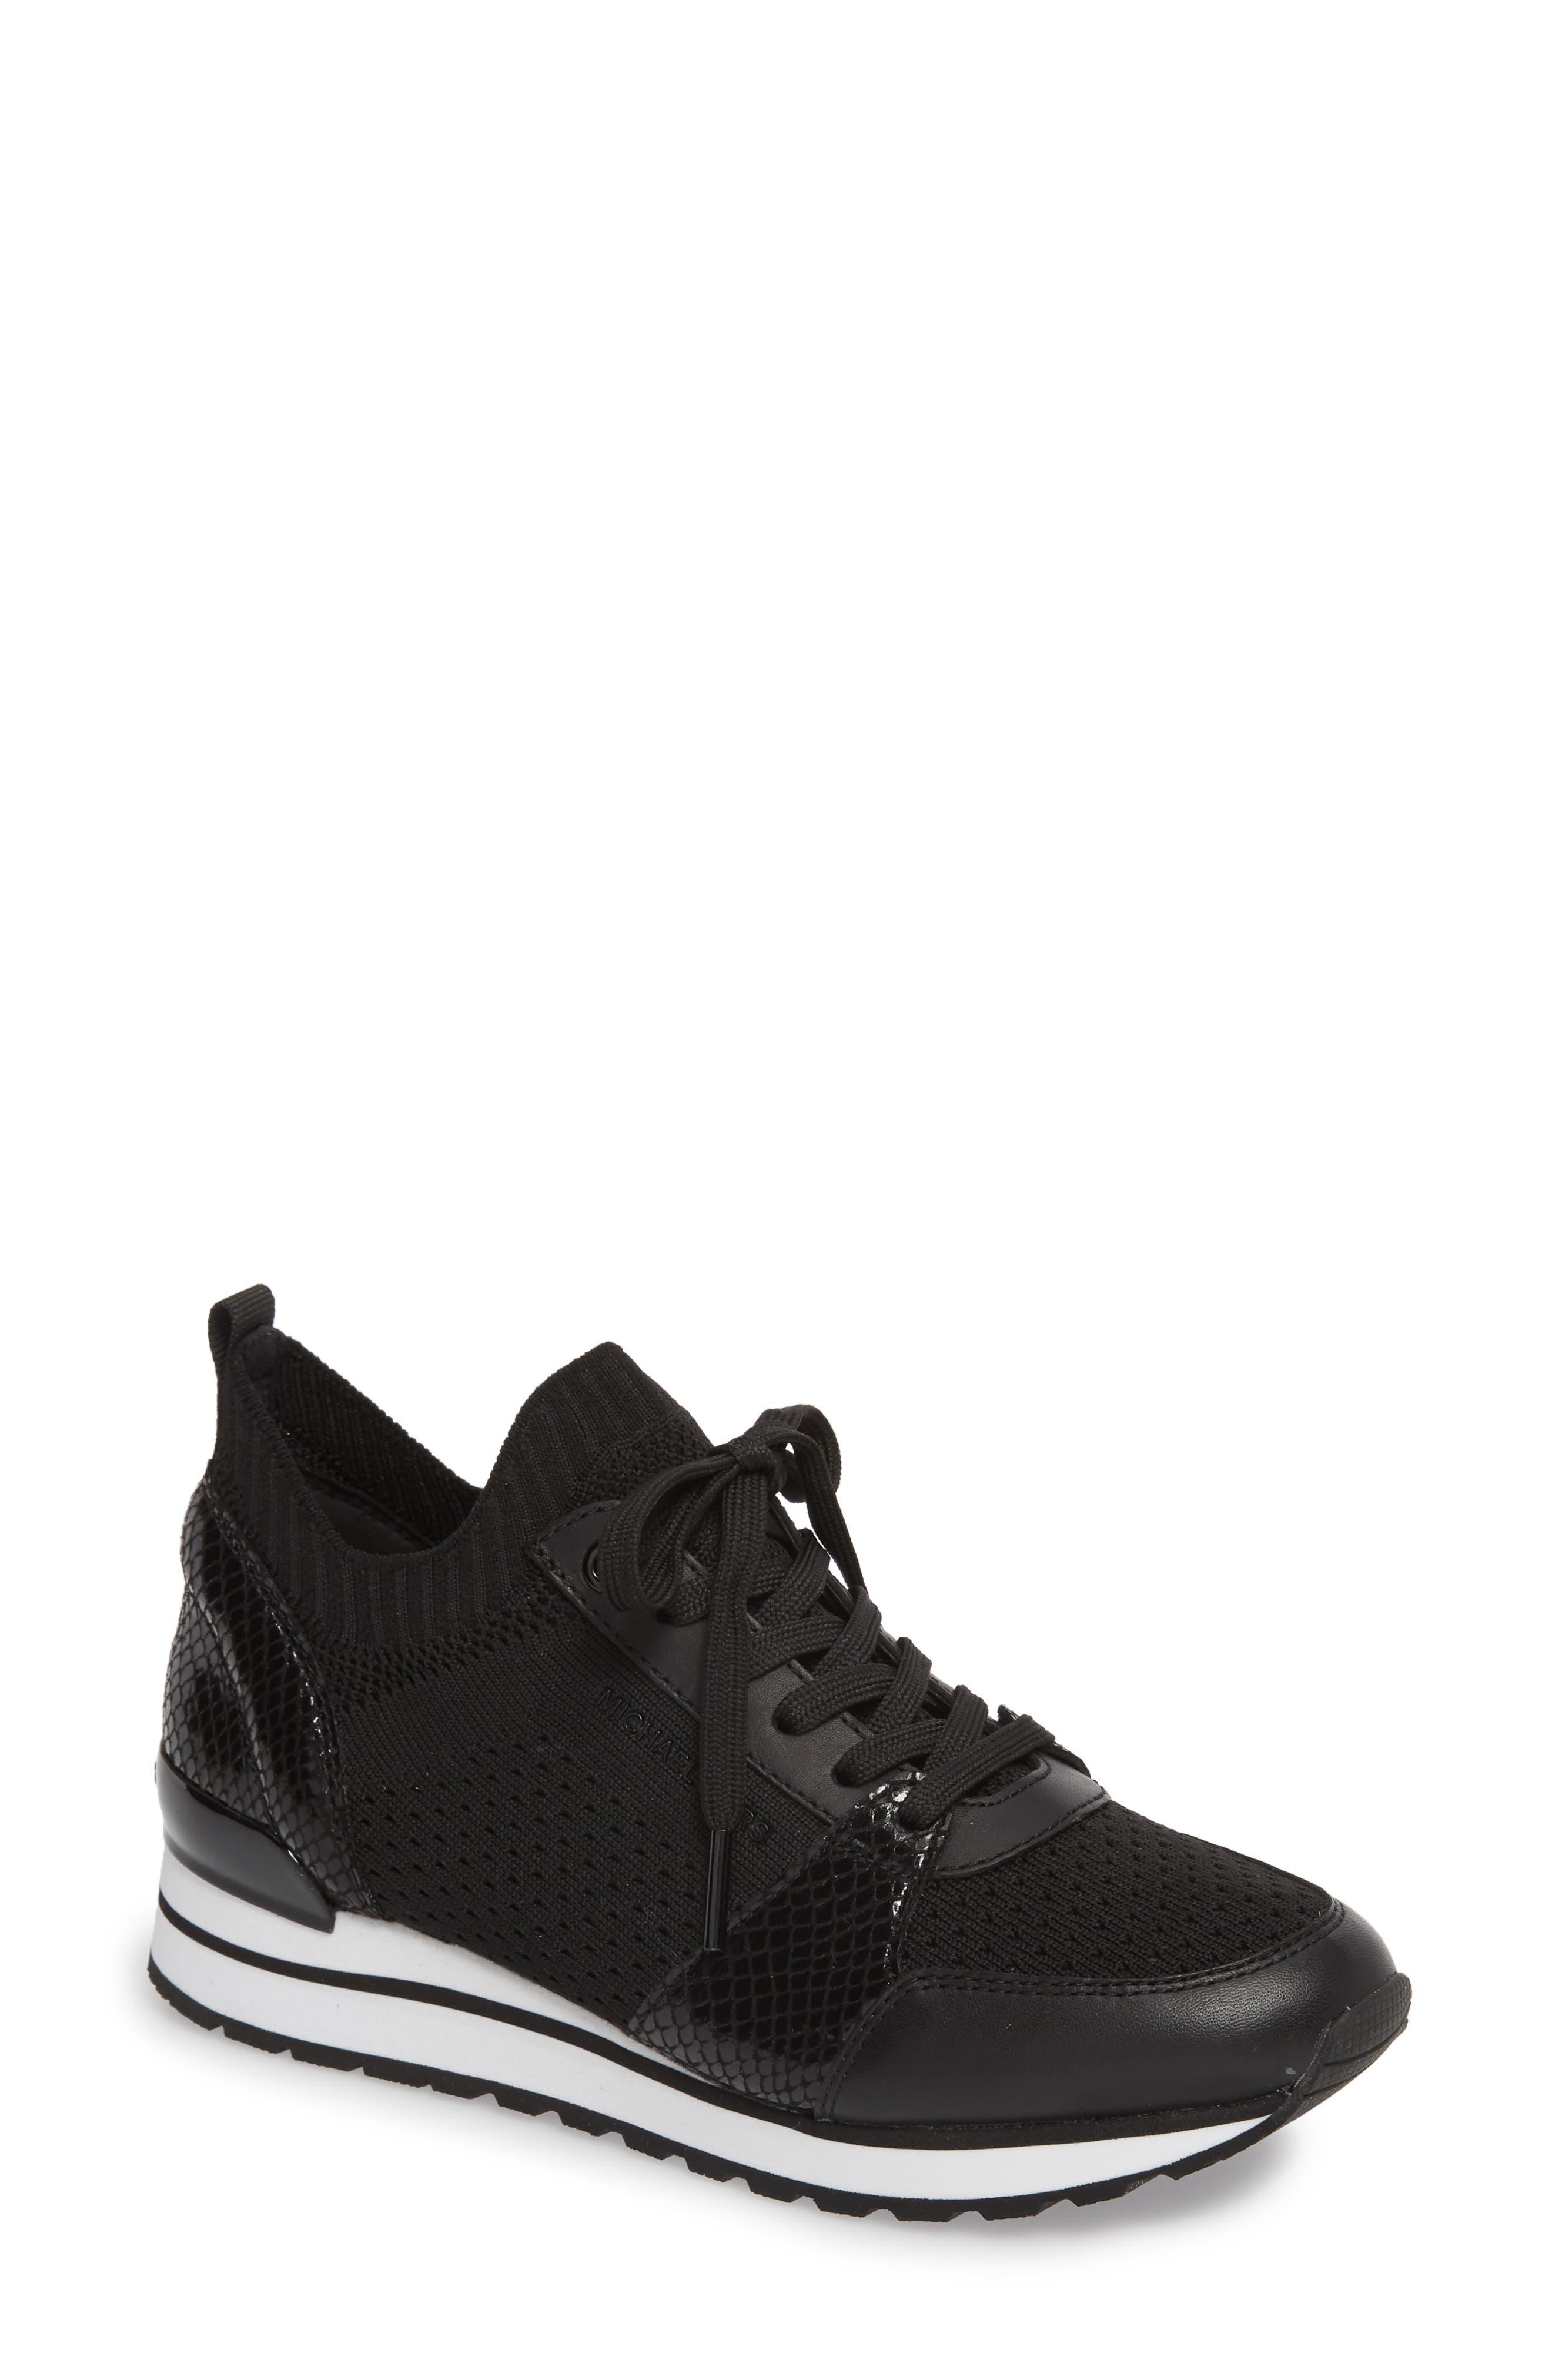 Billie Perforated Sneaker,                         Main,                         color, 002